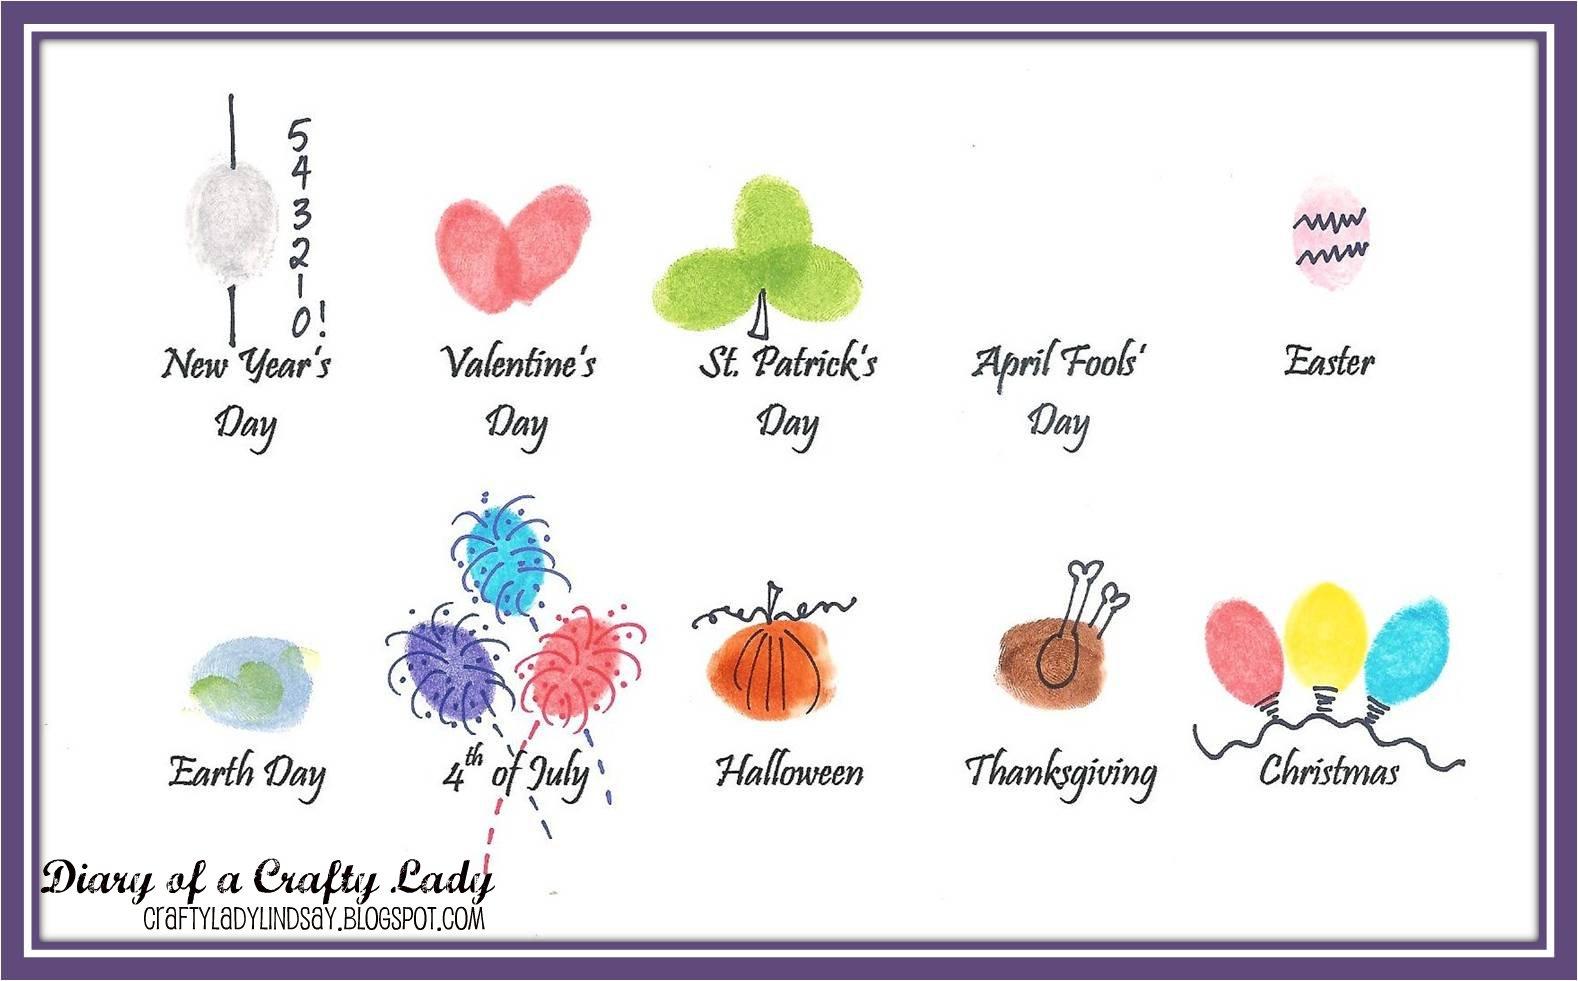 Diary Of A Crafty Lady Holidays Thumbprint Art